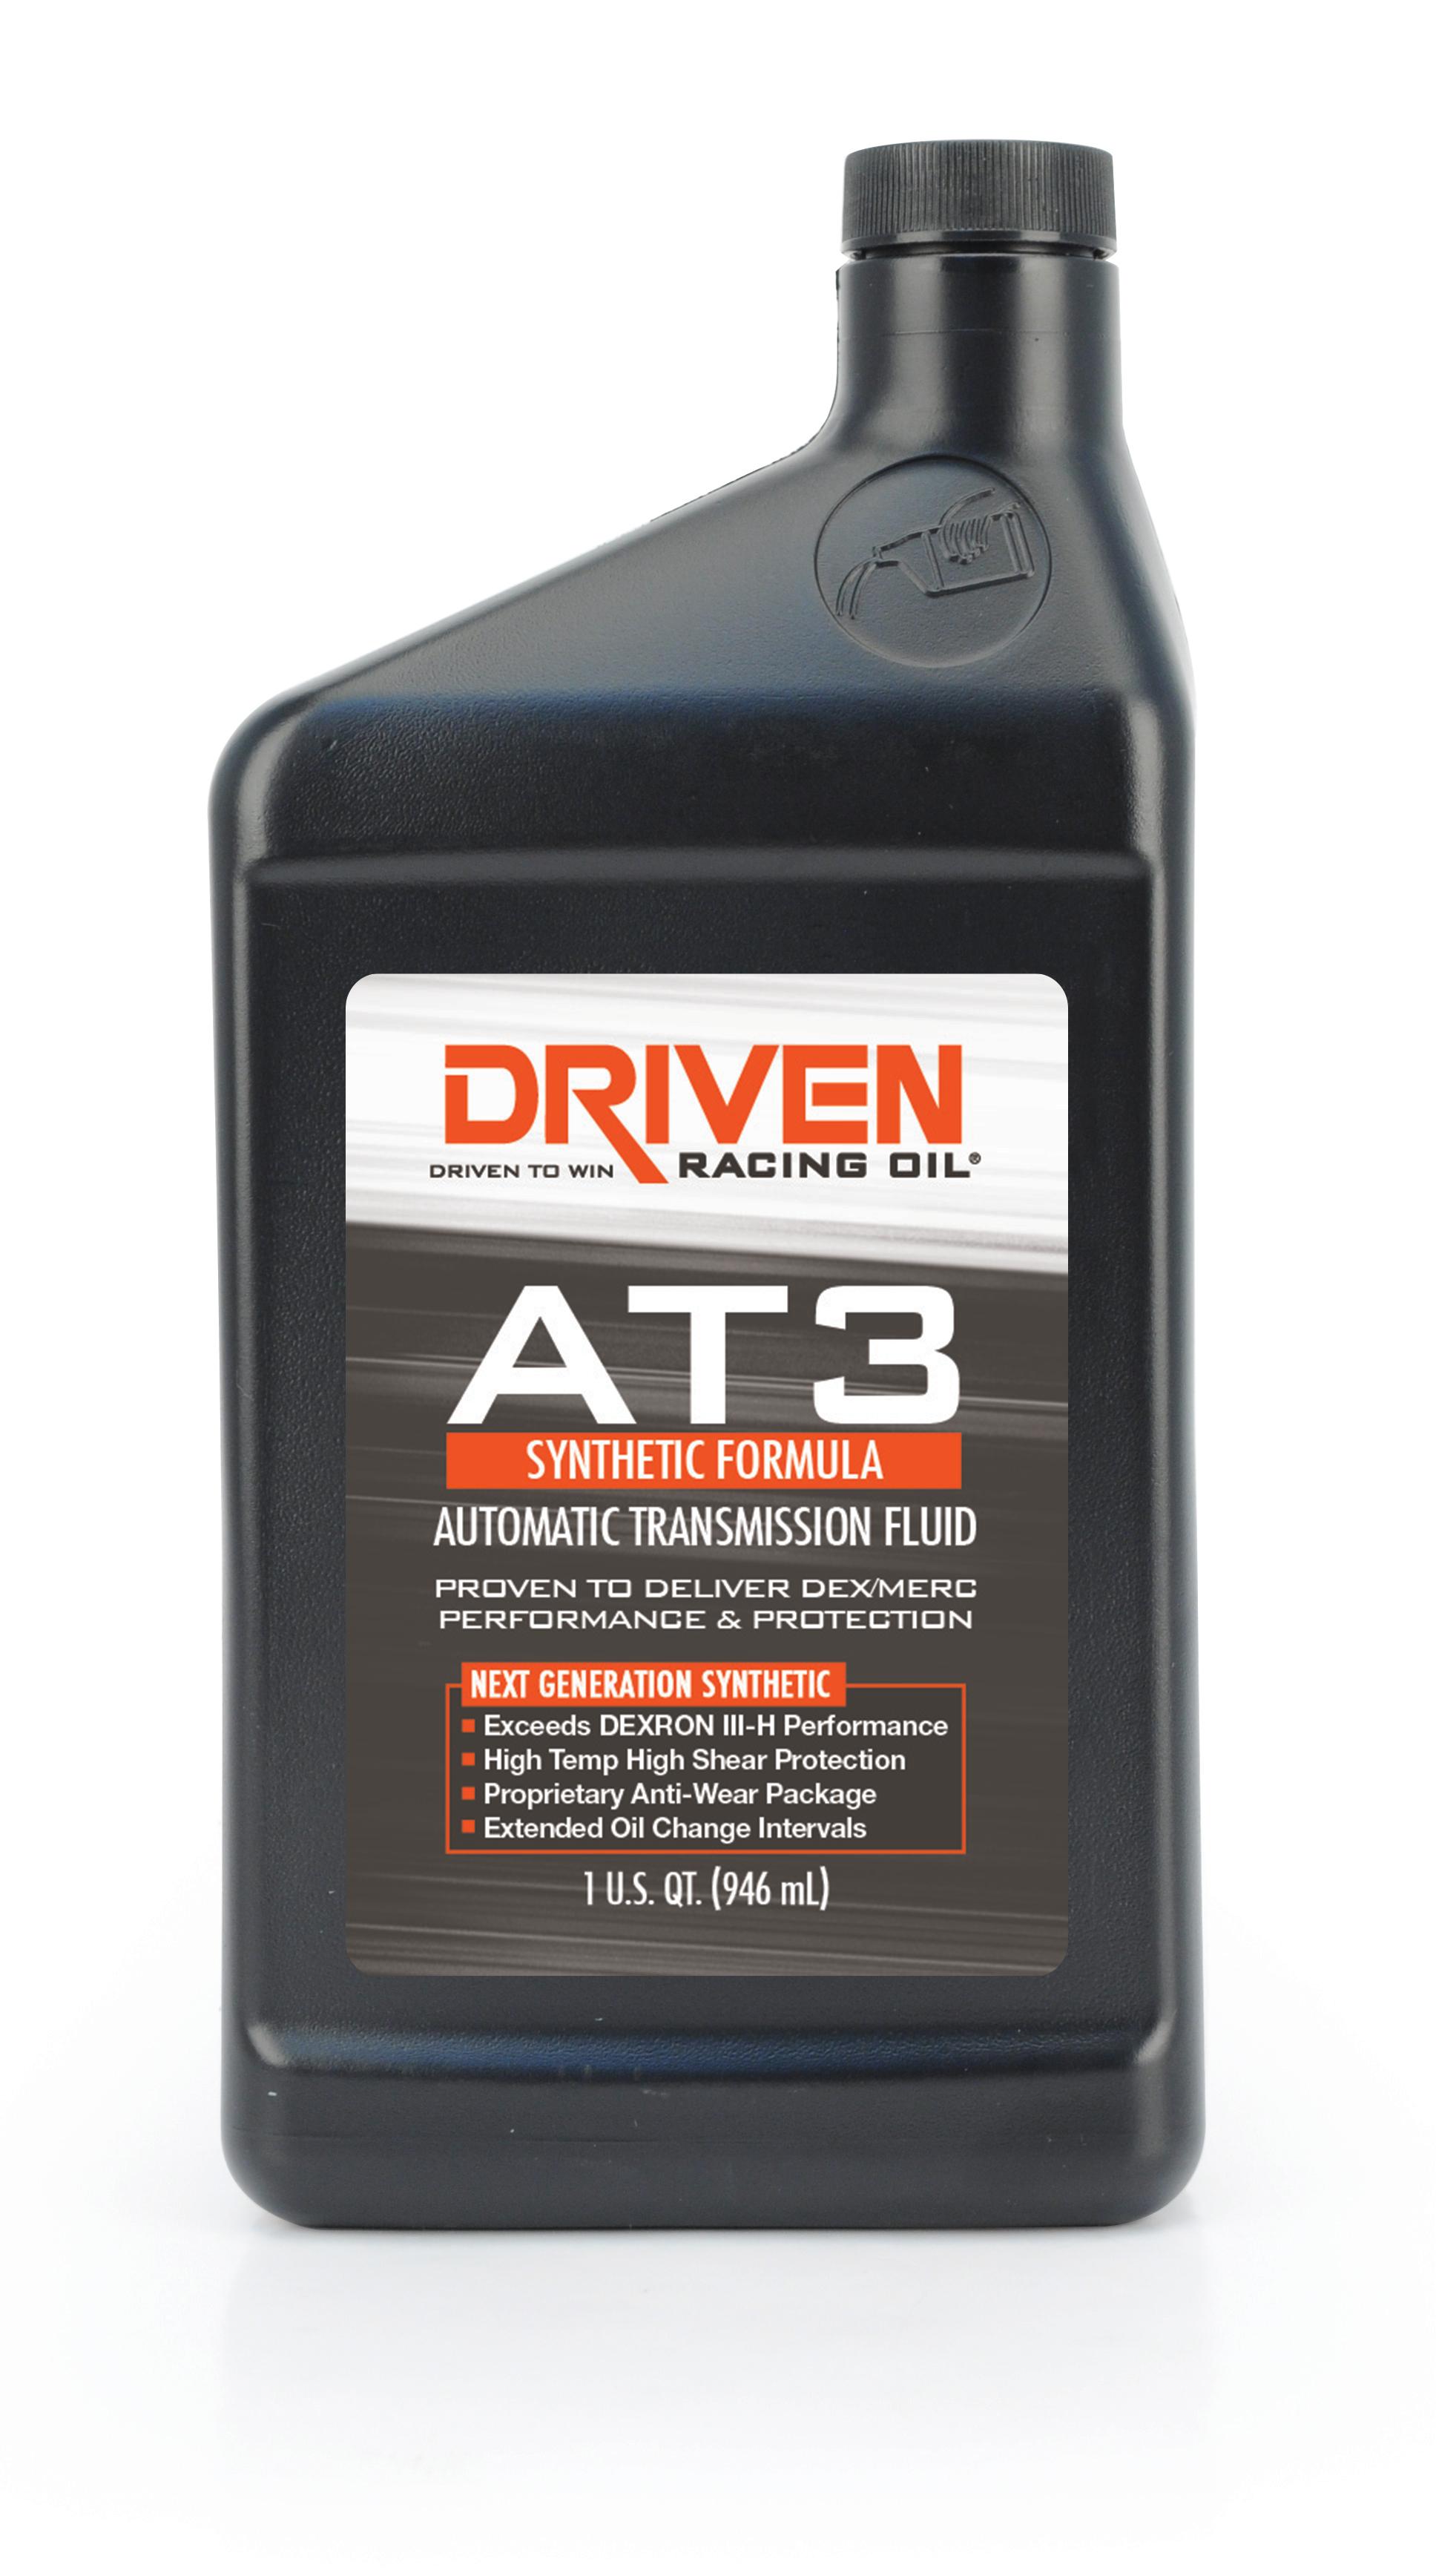 Driven Racing Oil AT3 Synthetic Dex/Merc Transmission Fluid 1 Qt.